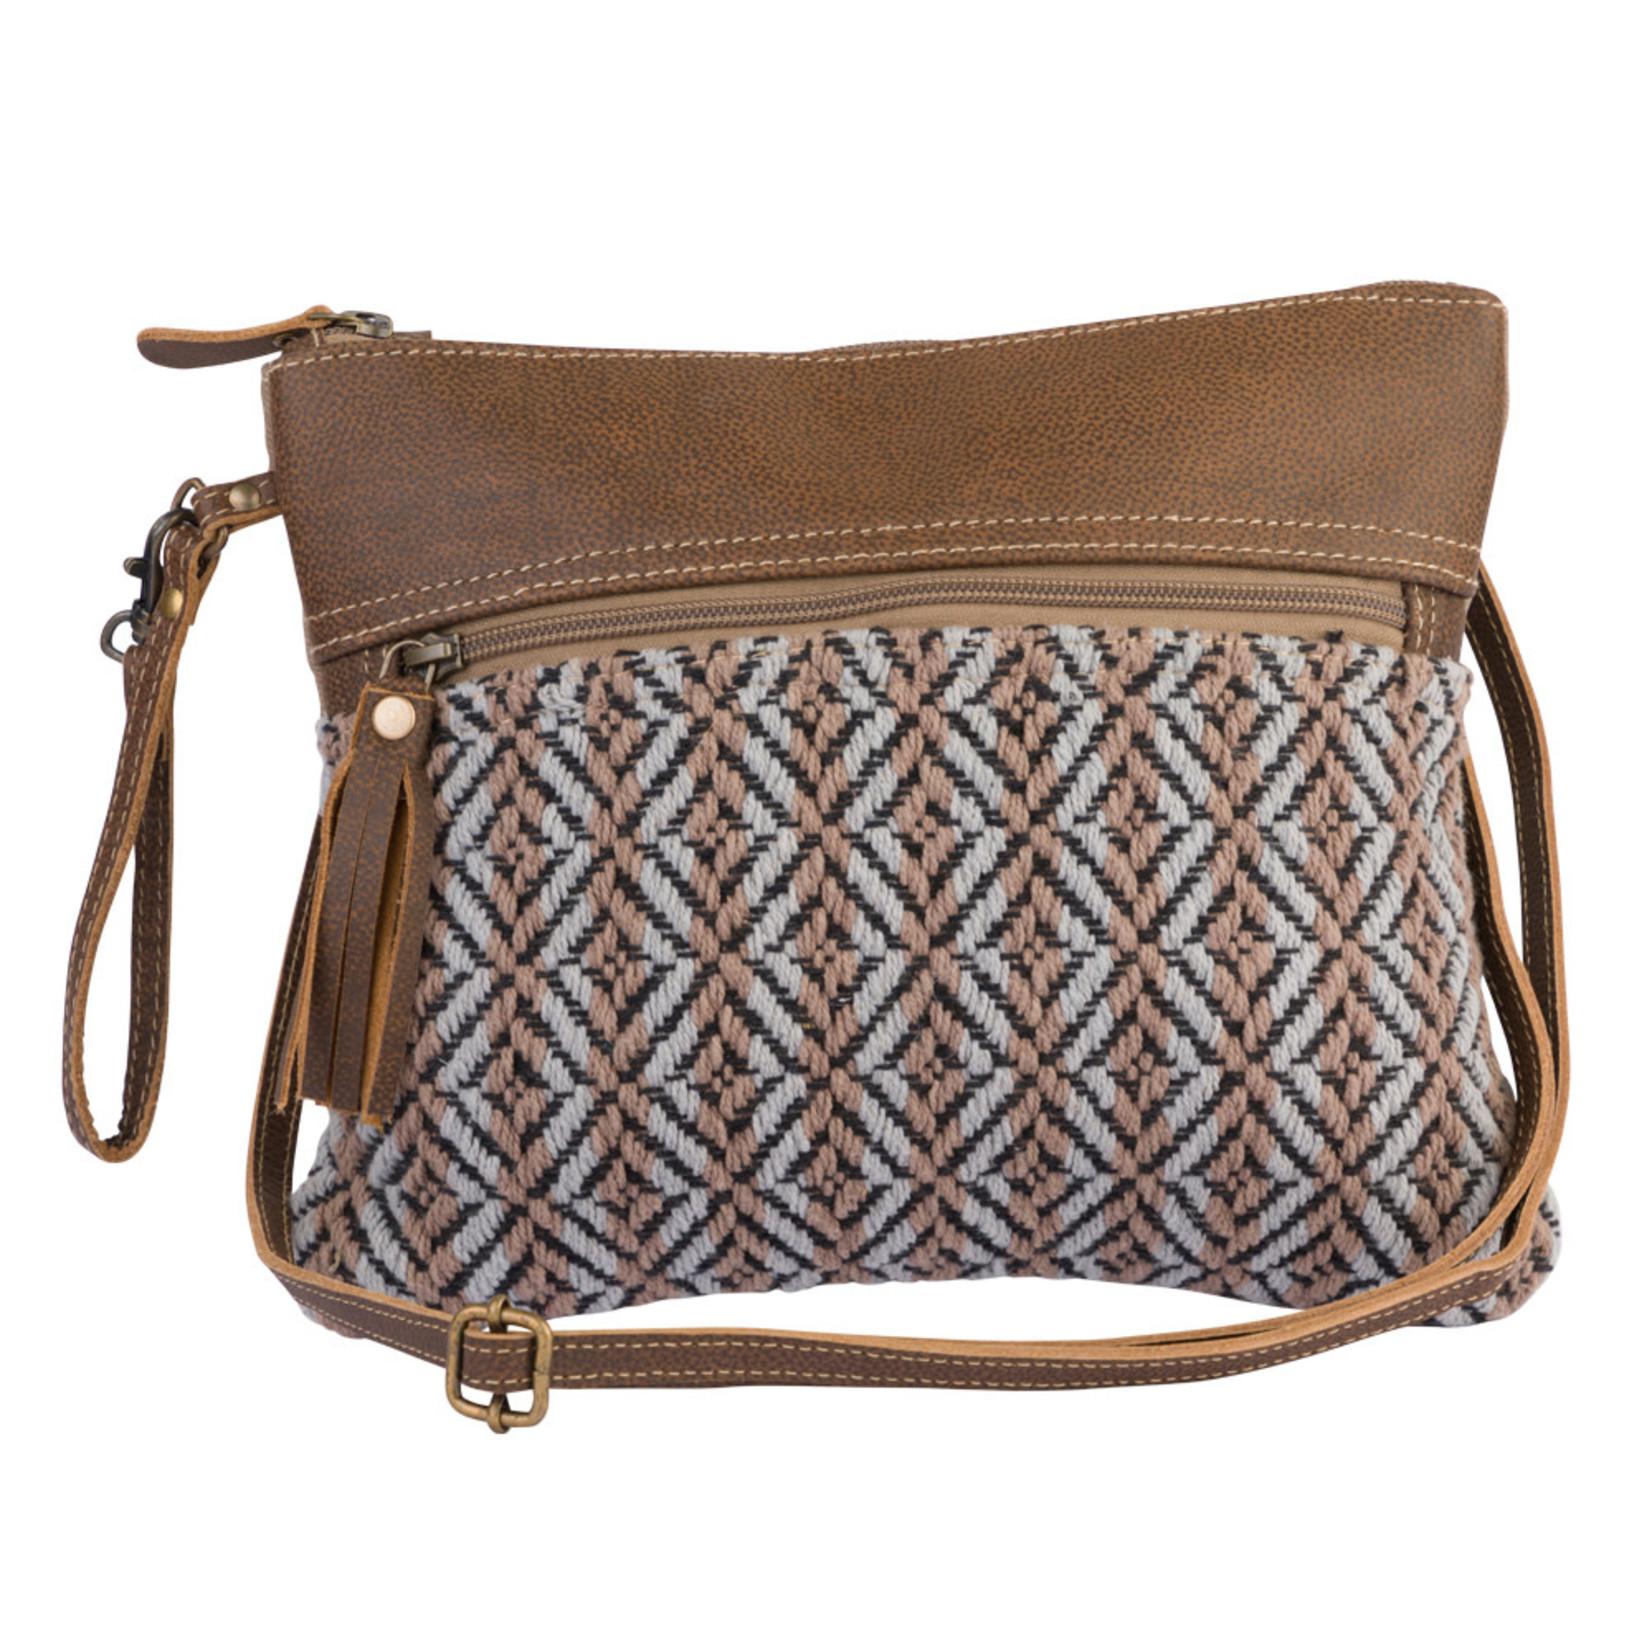 Myra Bags S-2212 Dark Ebullience Crossbody Bag